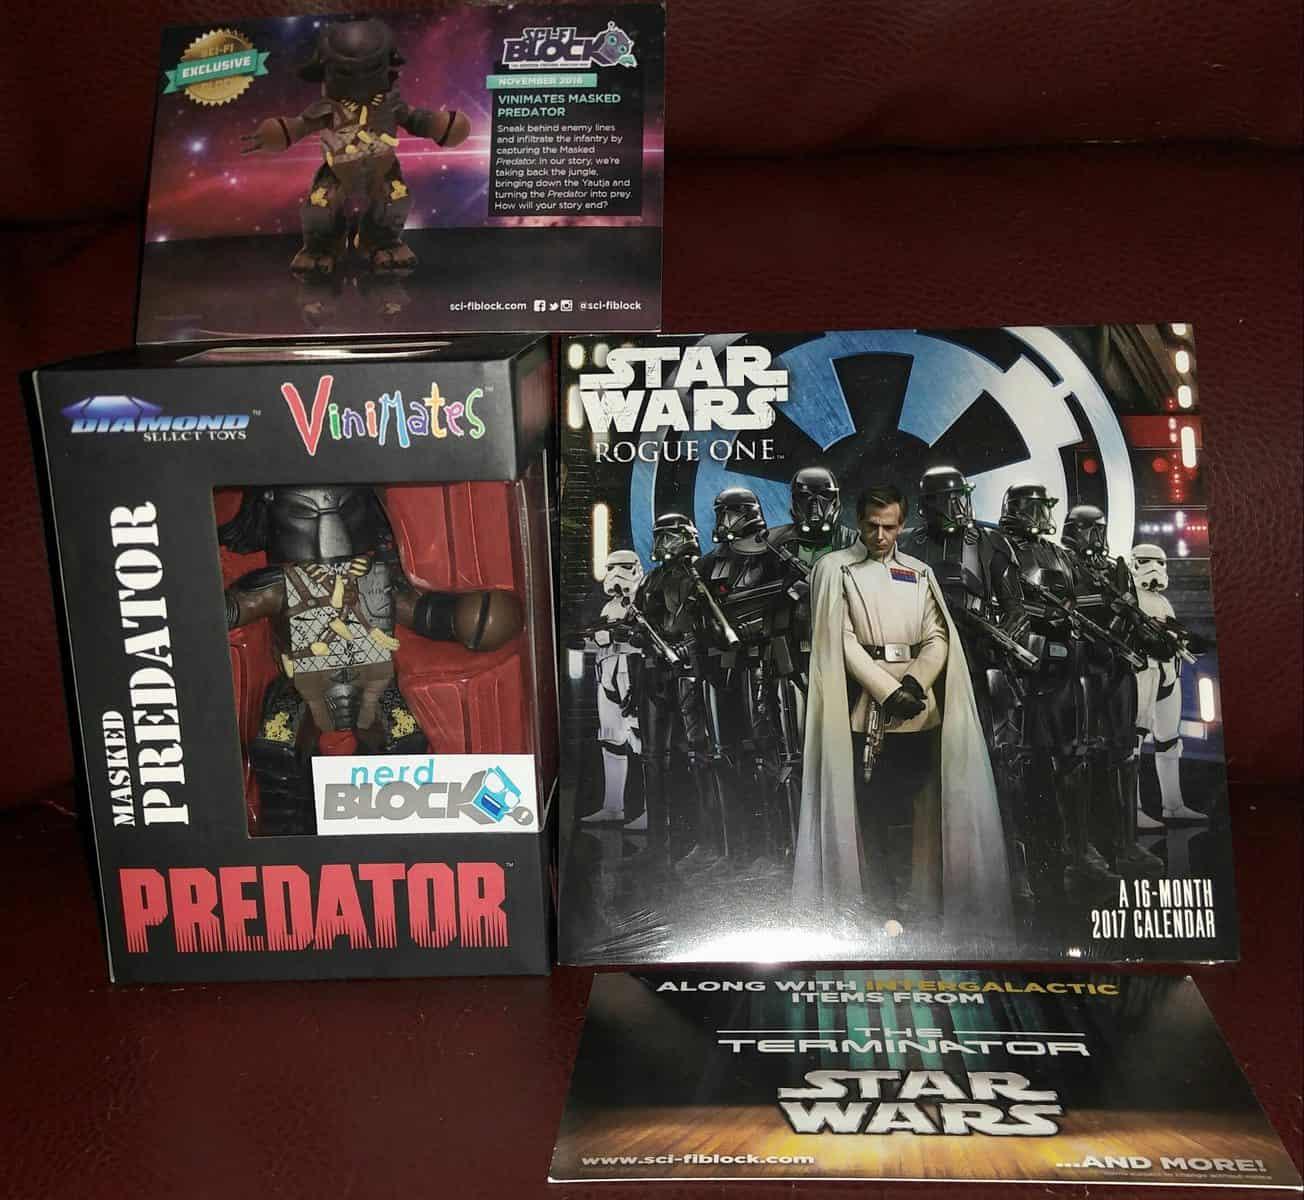 November 2016 Sci-Fi Block Review - Predator & Star Wars Calendar